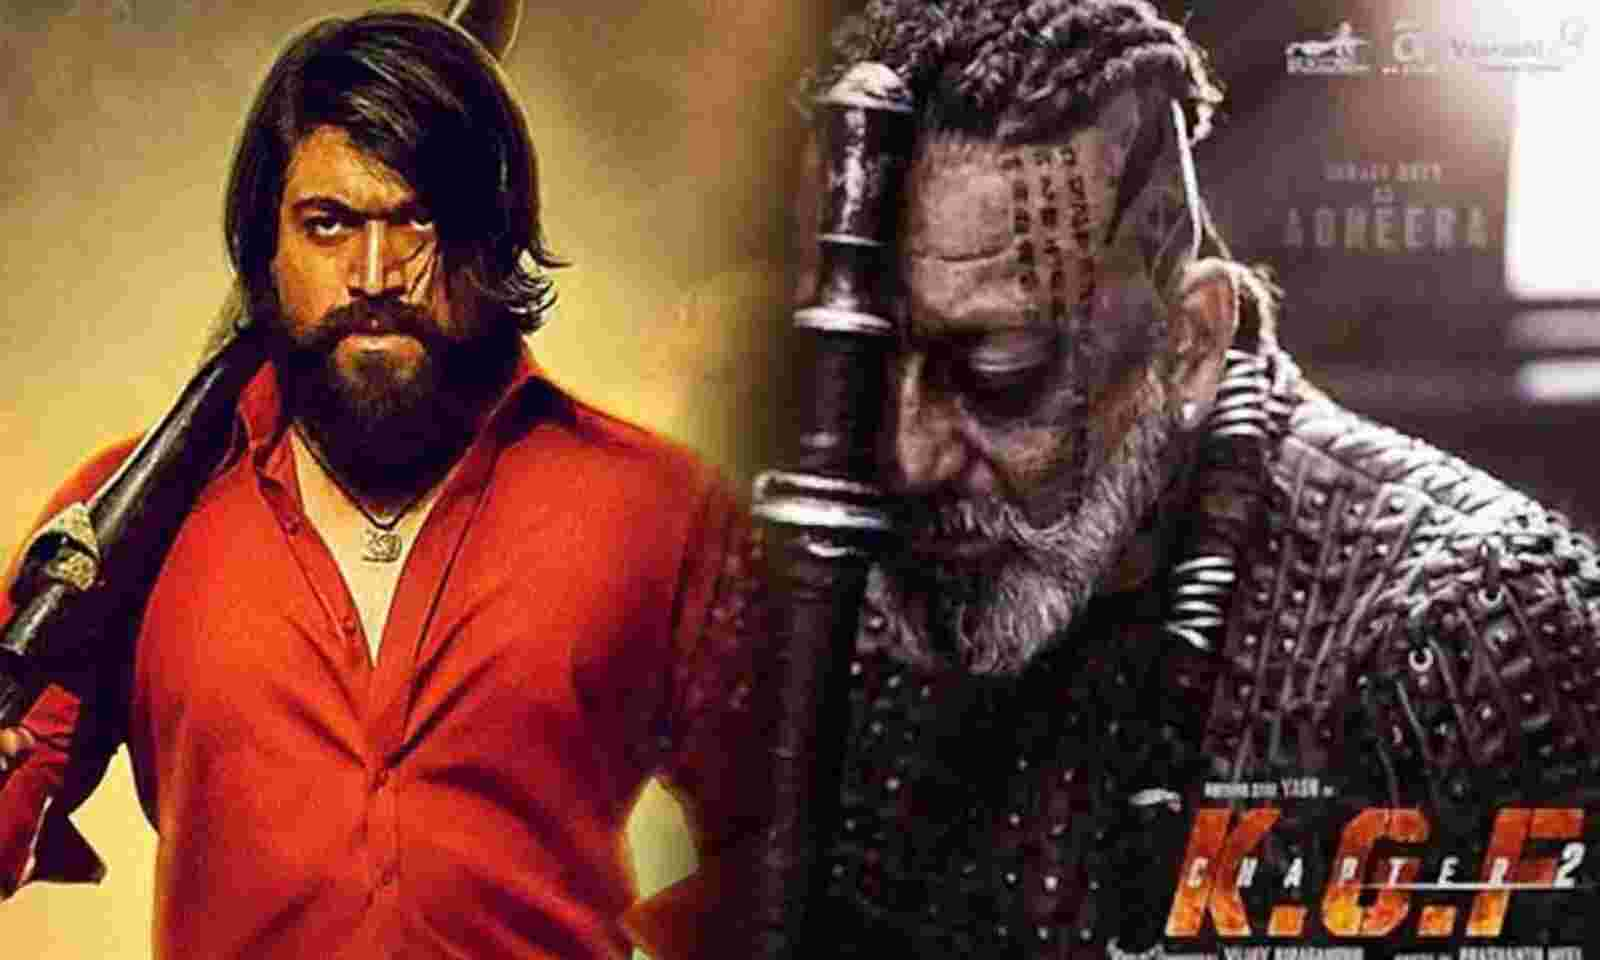 Download KGF Chapter 2 Full Movie in Hindi, Tamil, Telugu in 480p, 720p, & in 1080p